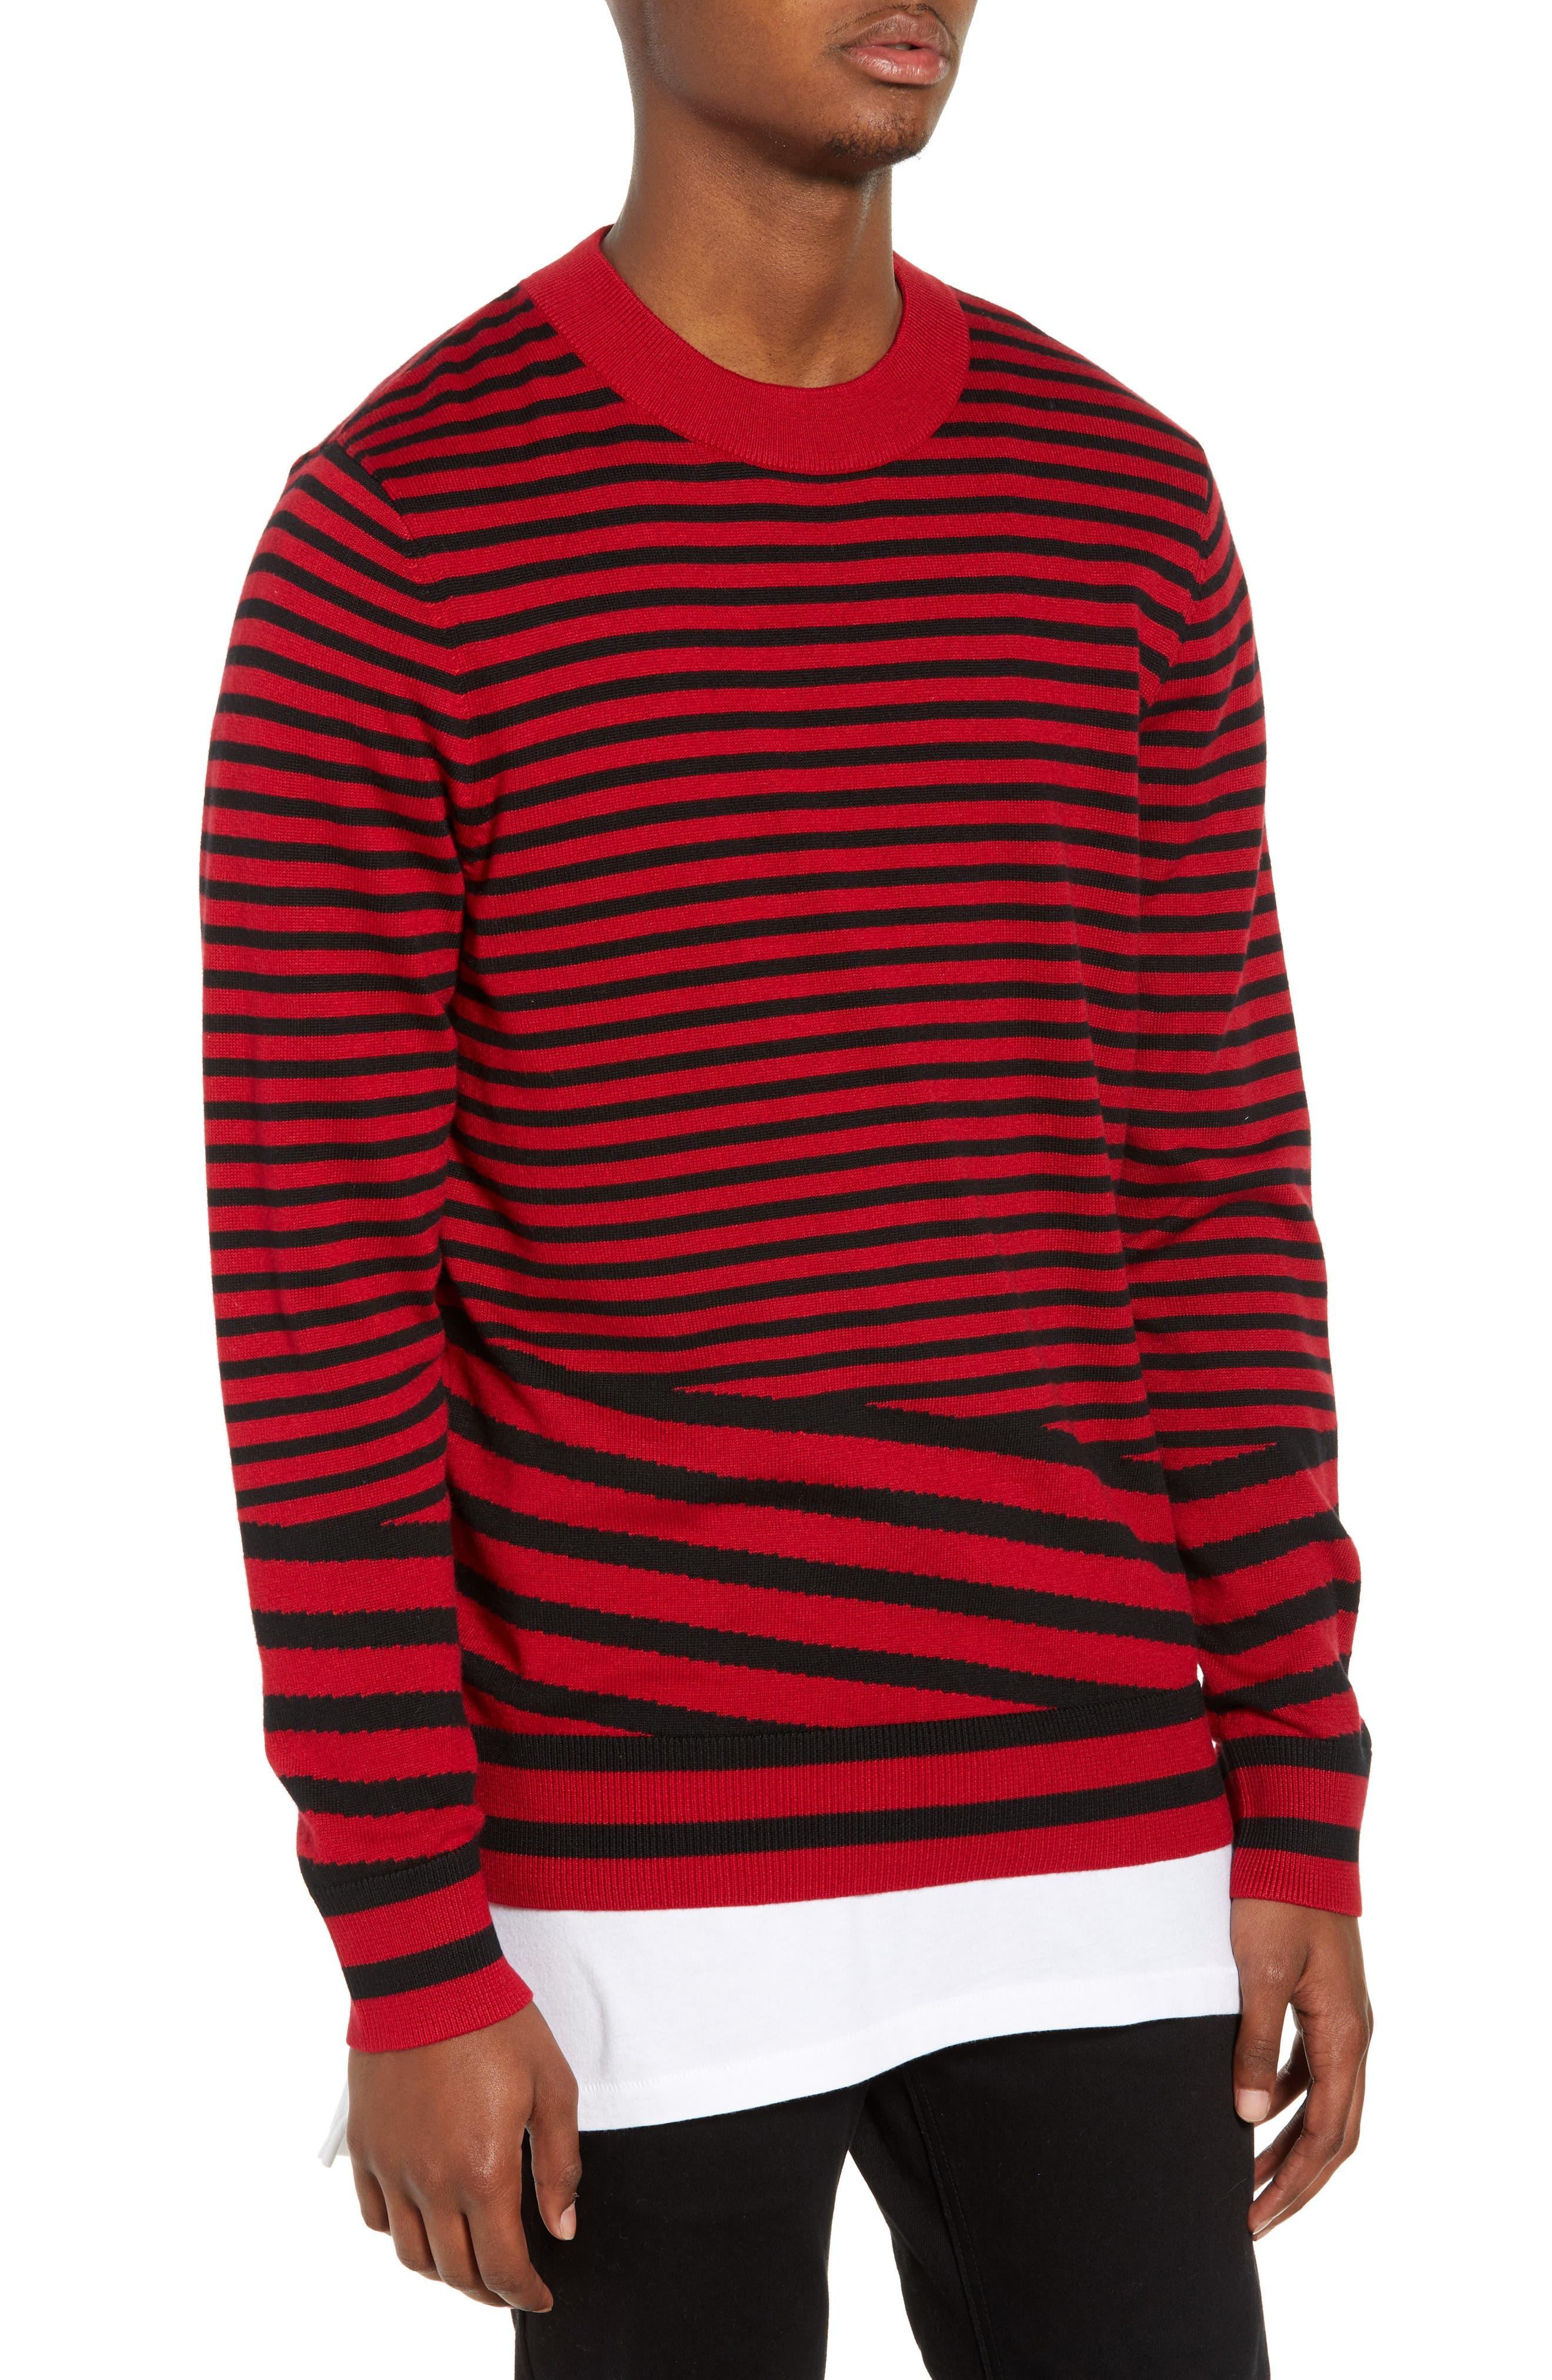 Asymmetrical Stripe Longline Sweater,                         Main,                         color, RED BLACK RETRO STRIPE